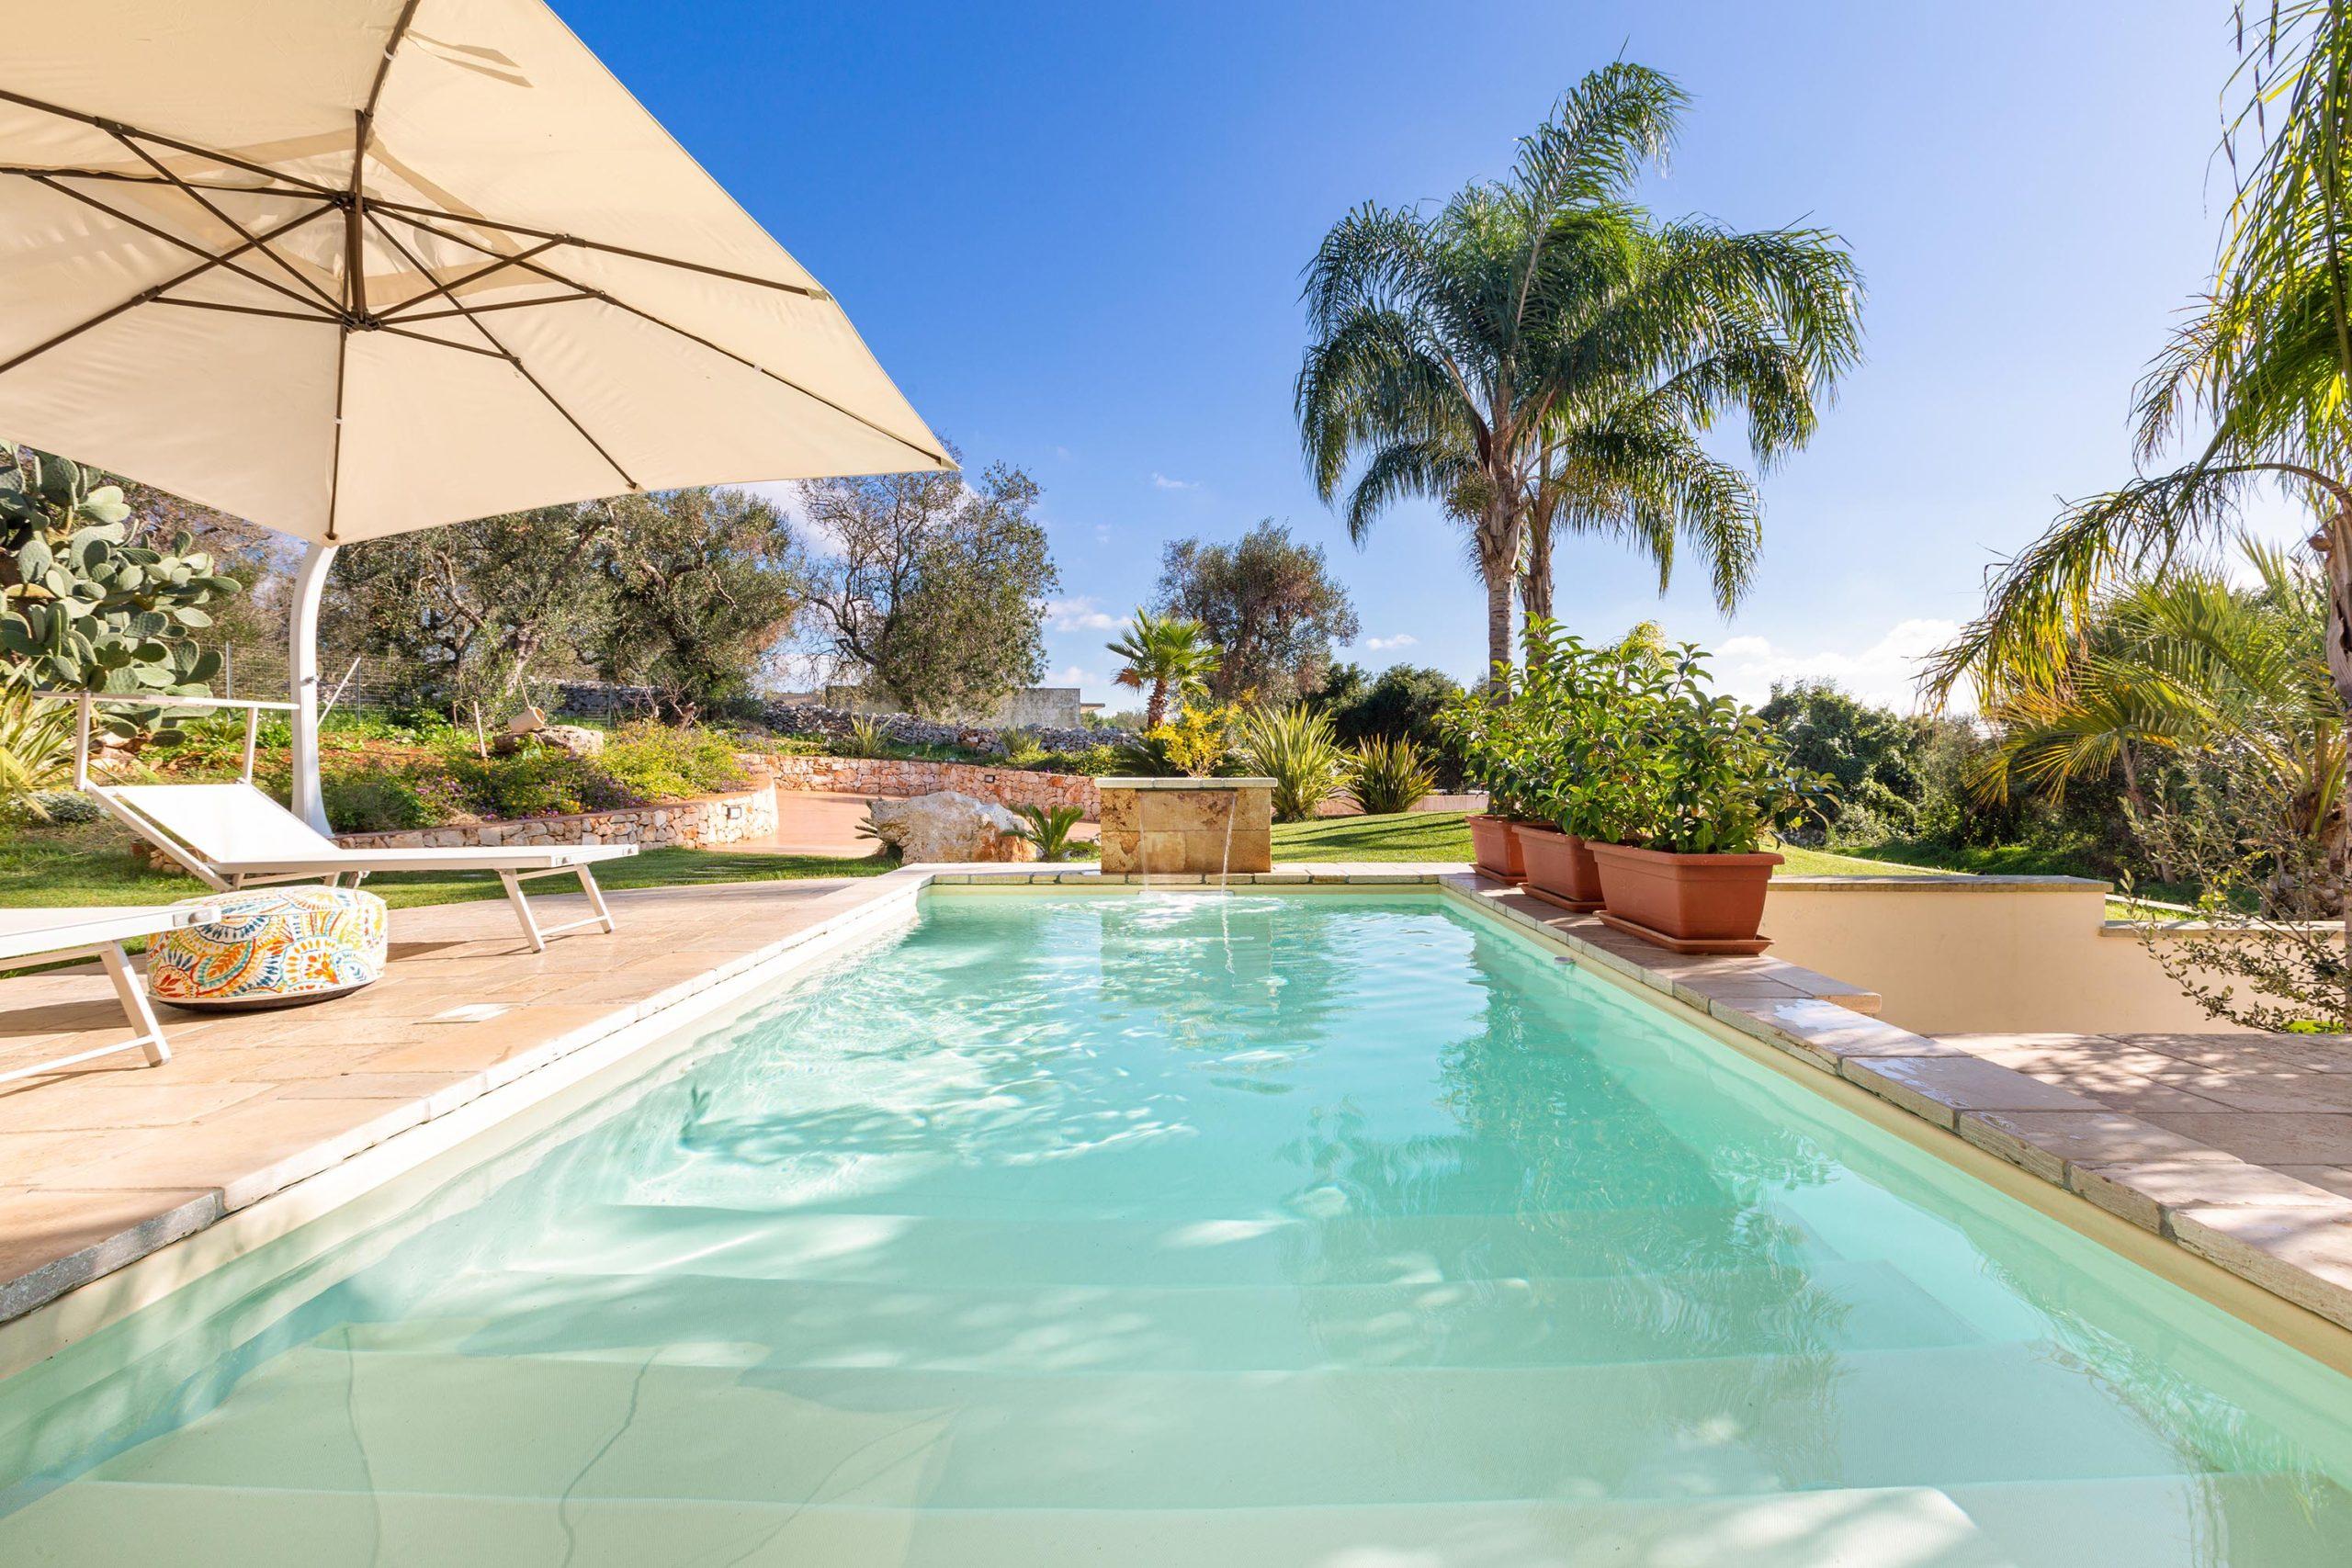 piscina 3x5 h1.20